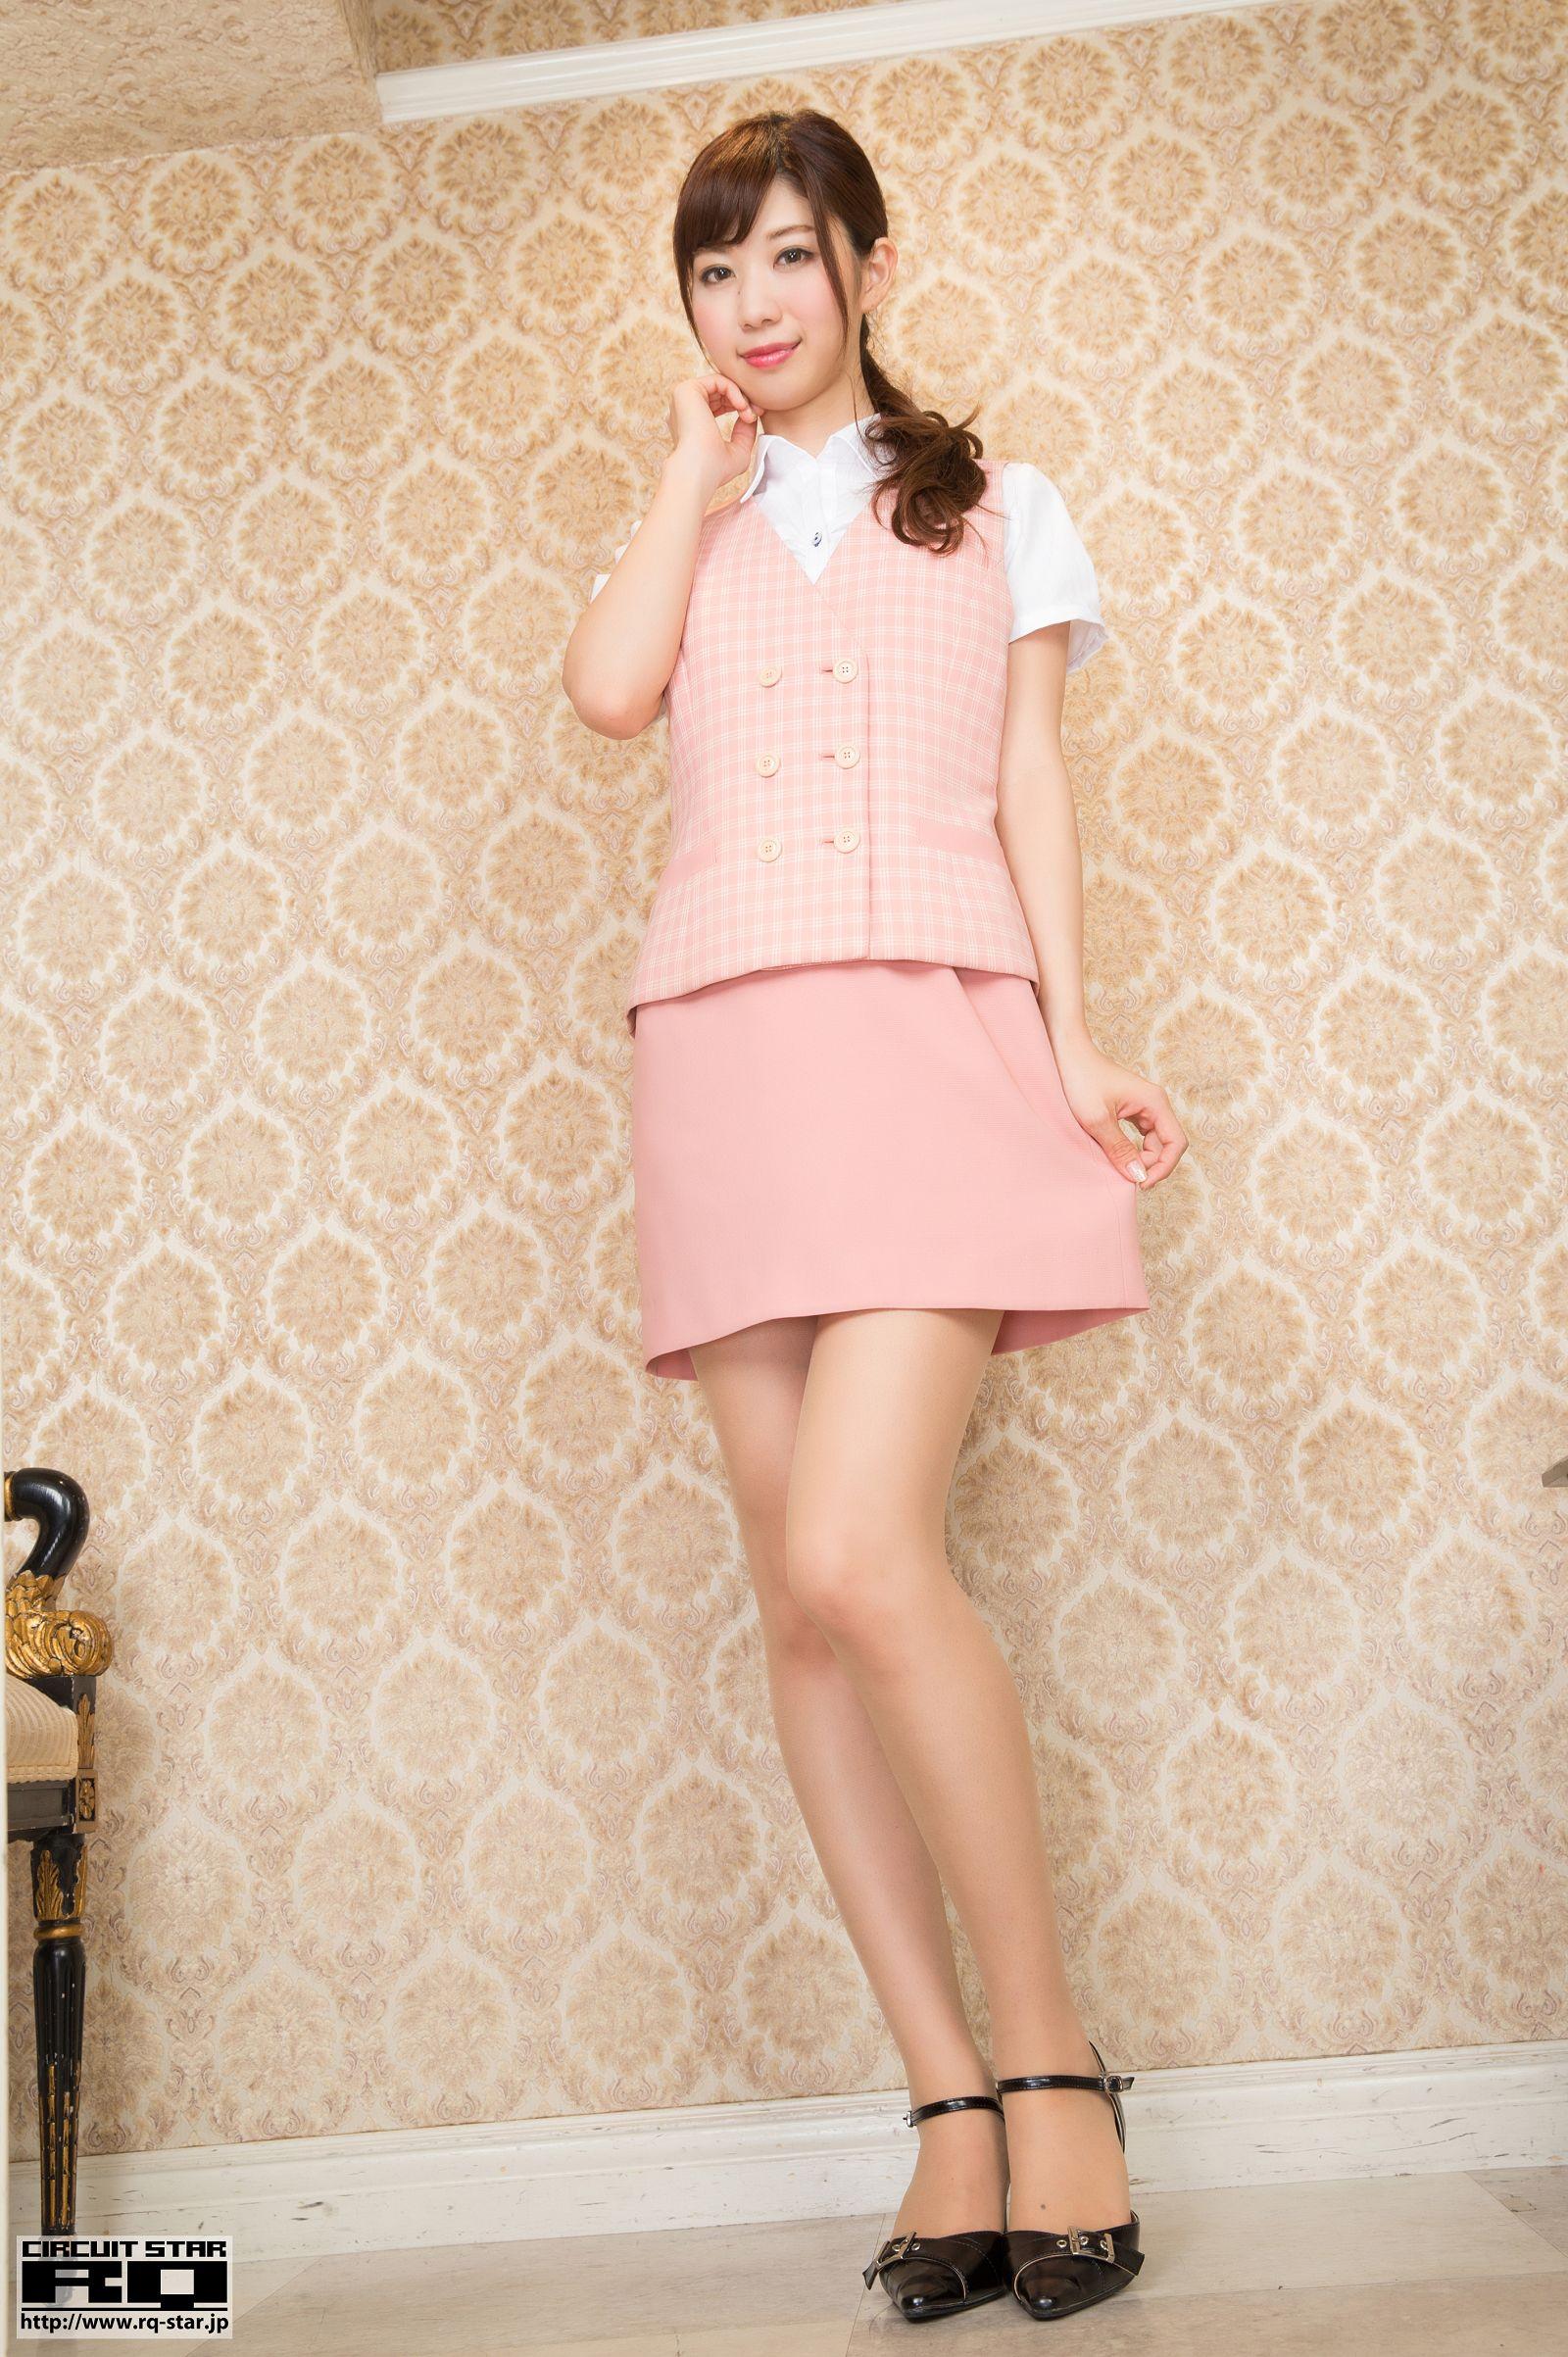 [RQ STAR美女] NO.01044 Chimu ちむ Office Lady[90P] RQ STAR 第1张